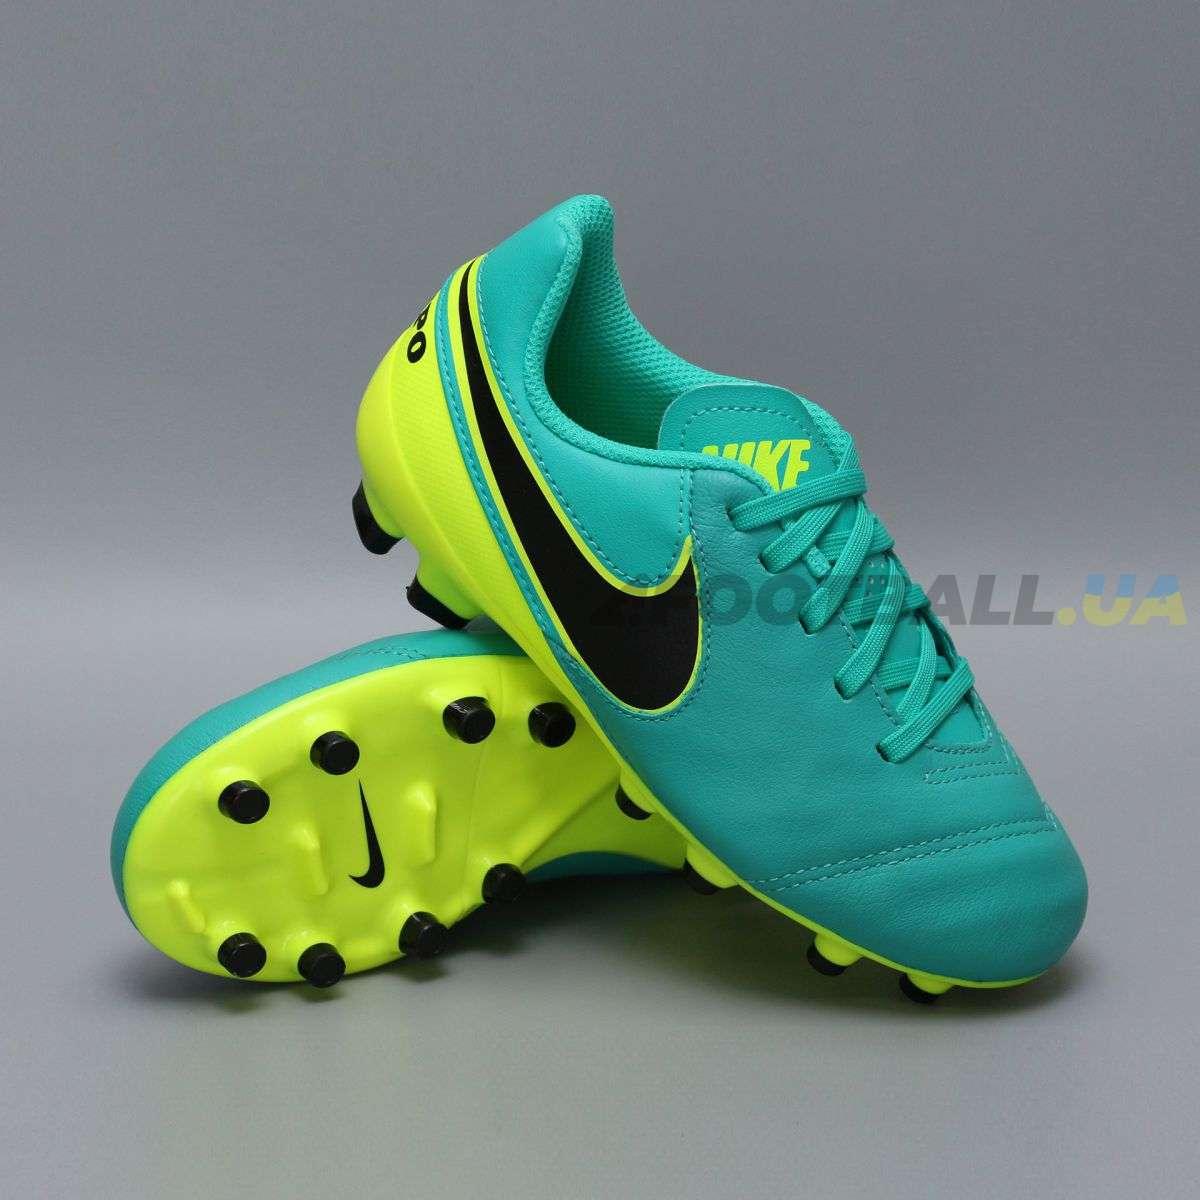 Детские бутсы Nike JR TIEMPOX LEGEND VI FG КОЖА - Bermuda   819186-307 78168b7674f